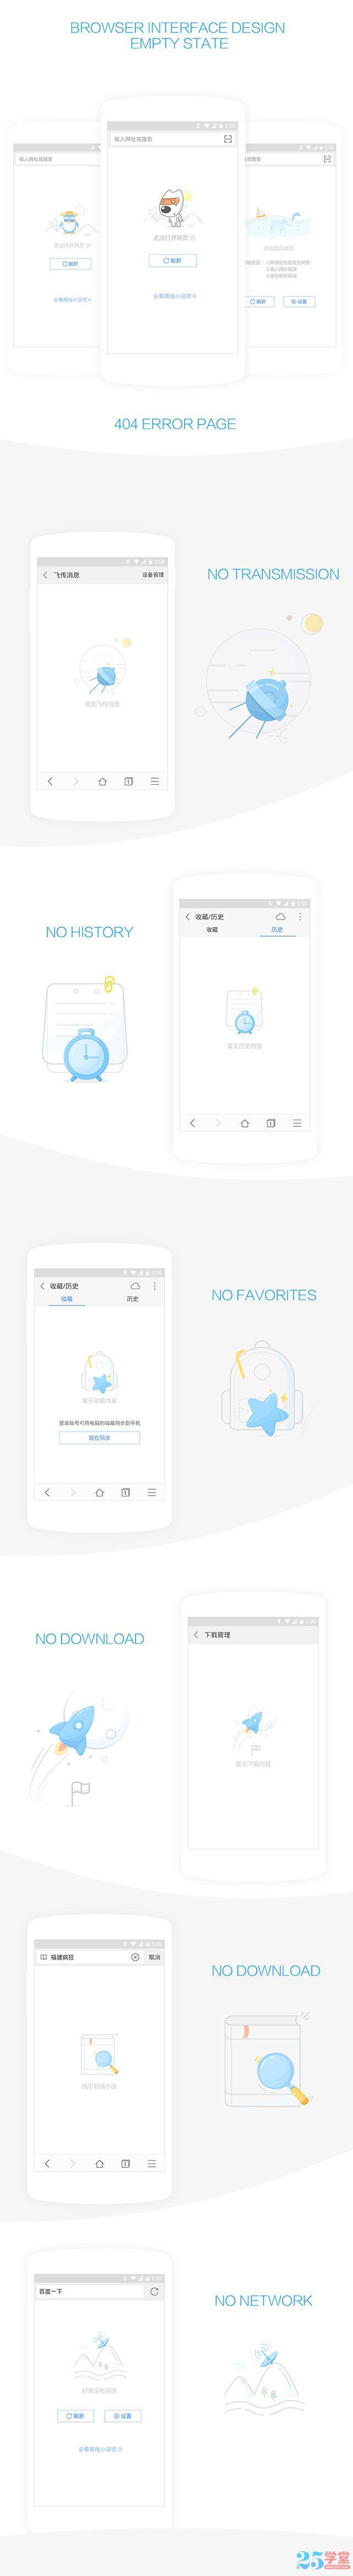 app空状态设计学习